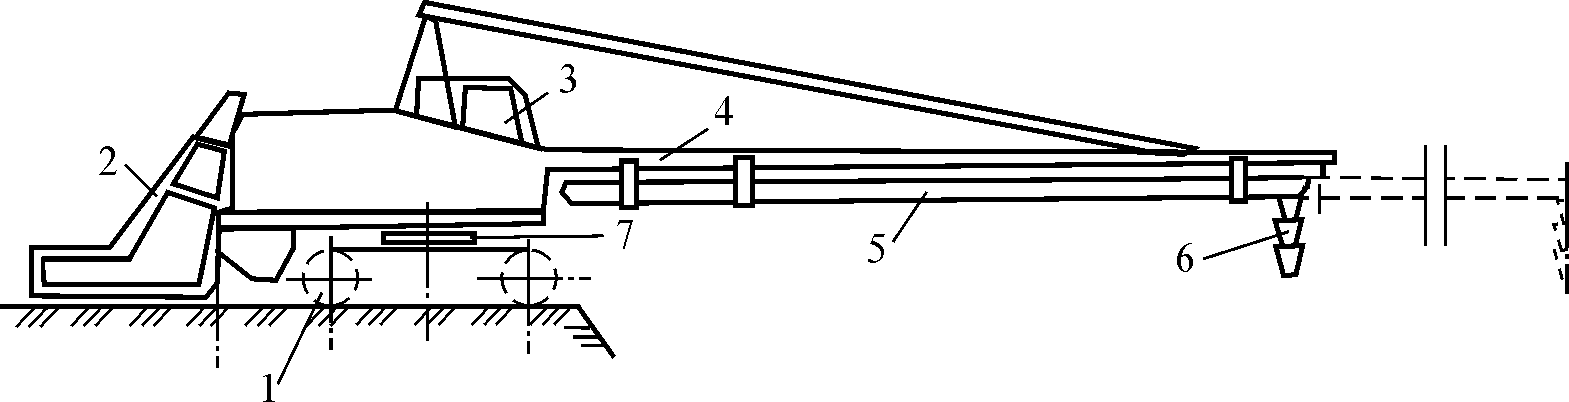 Схема самоходного бетоноукладчика